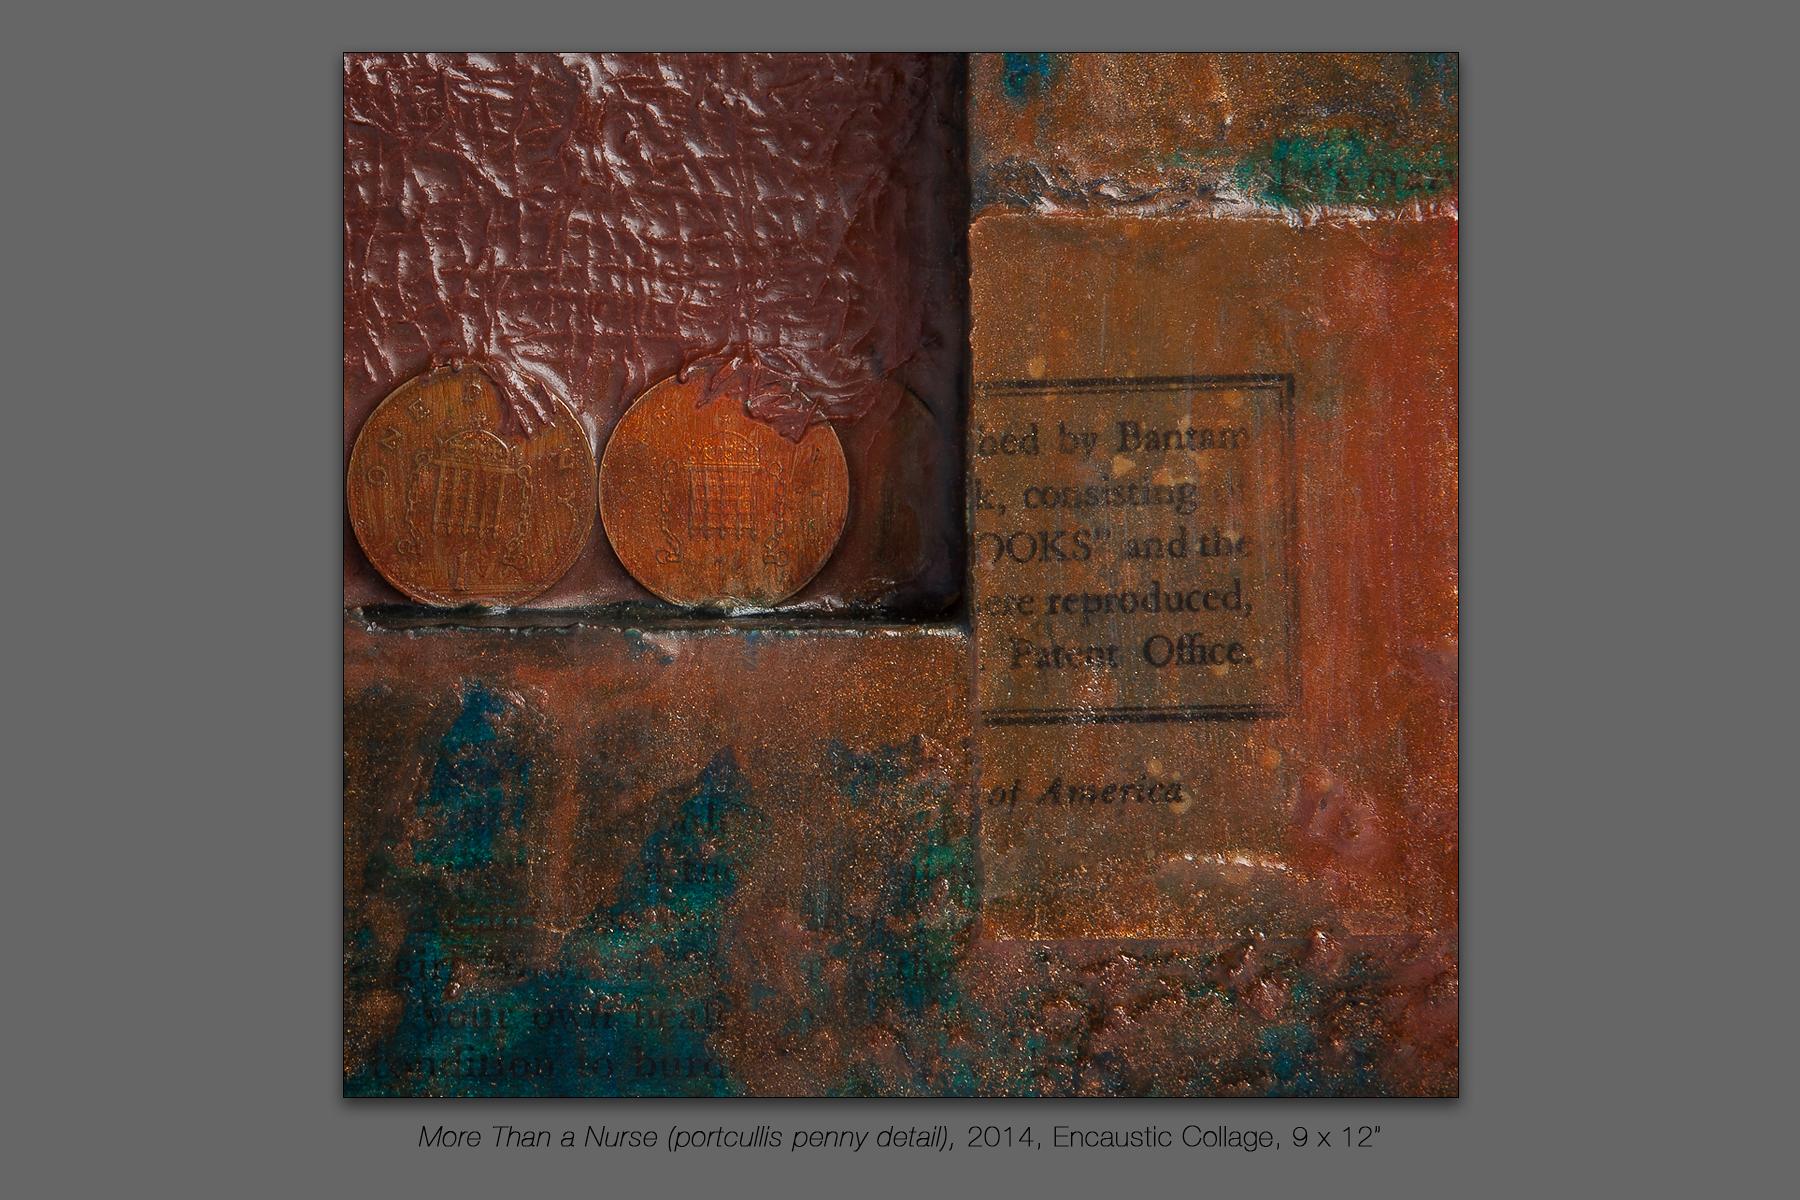 More Than a Nurse (portcullis penny detail), 2014